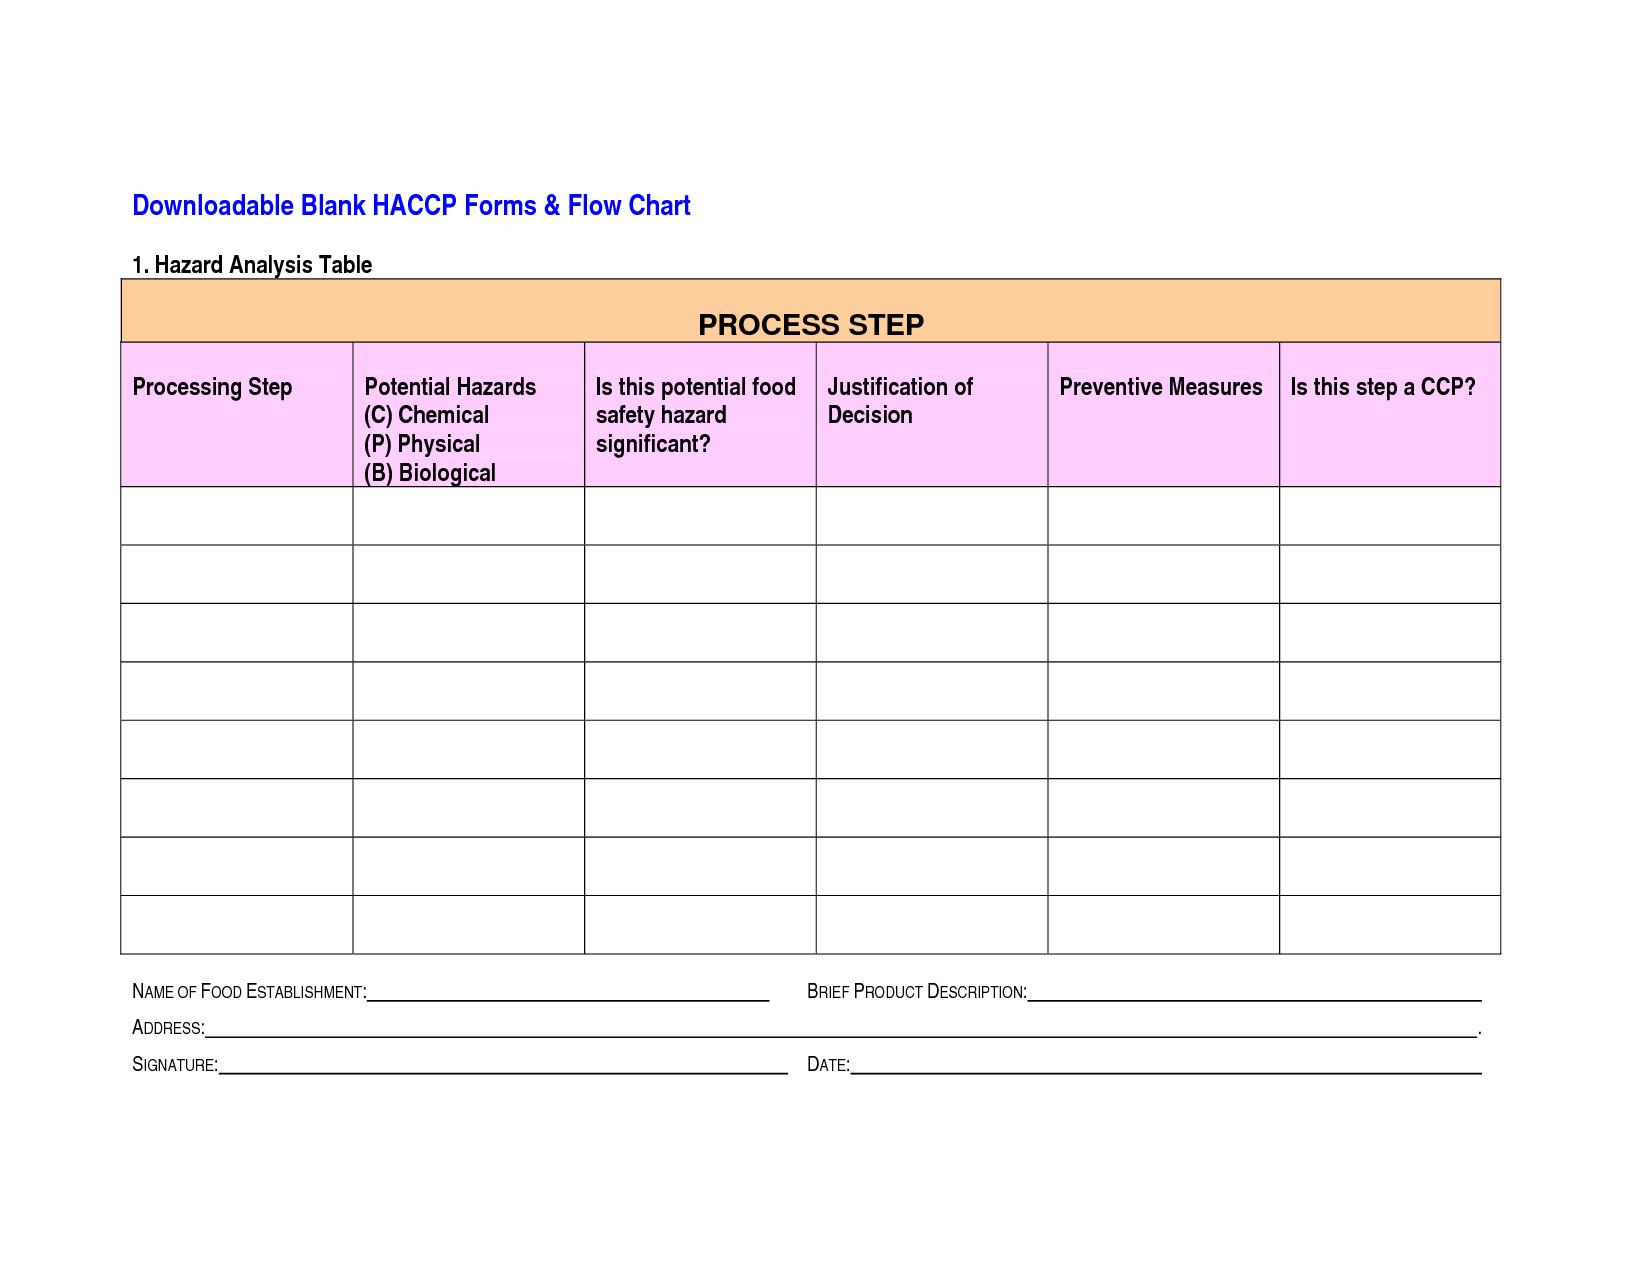 post blank haccp flow chart template printable 104196